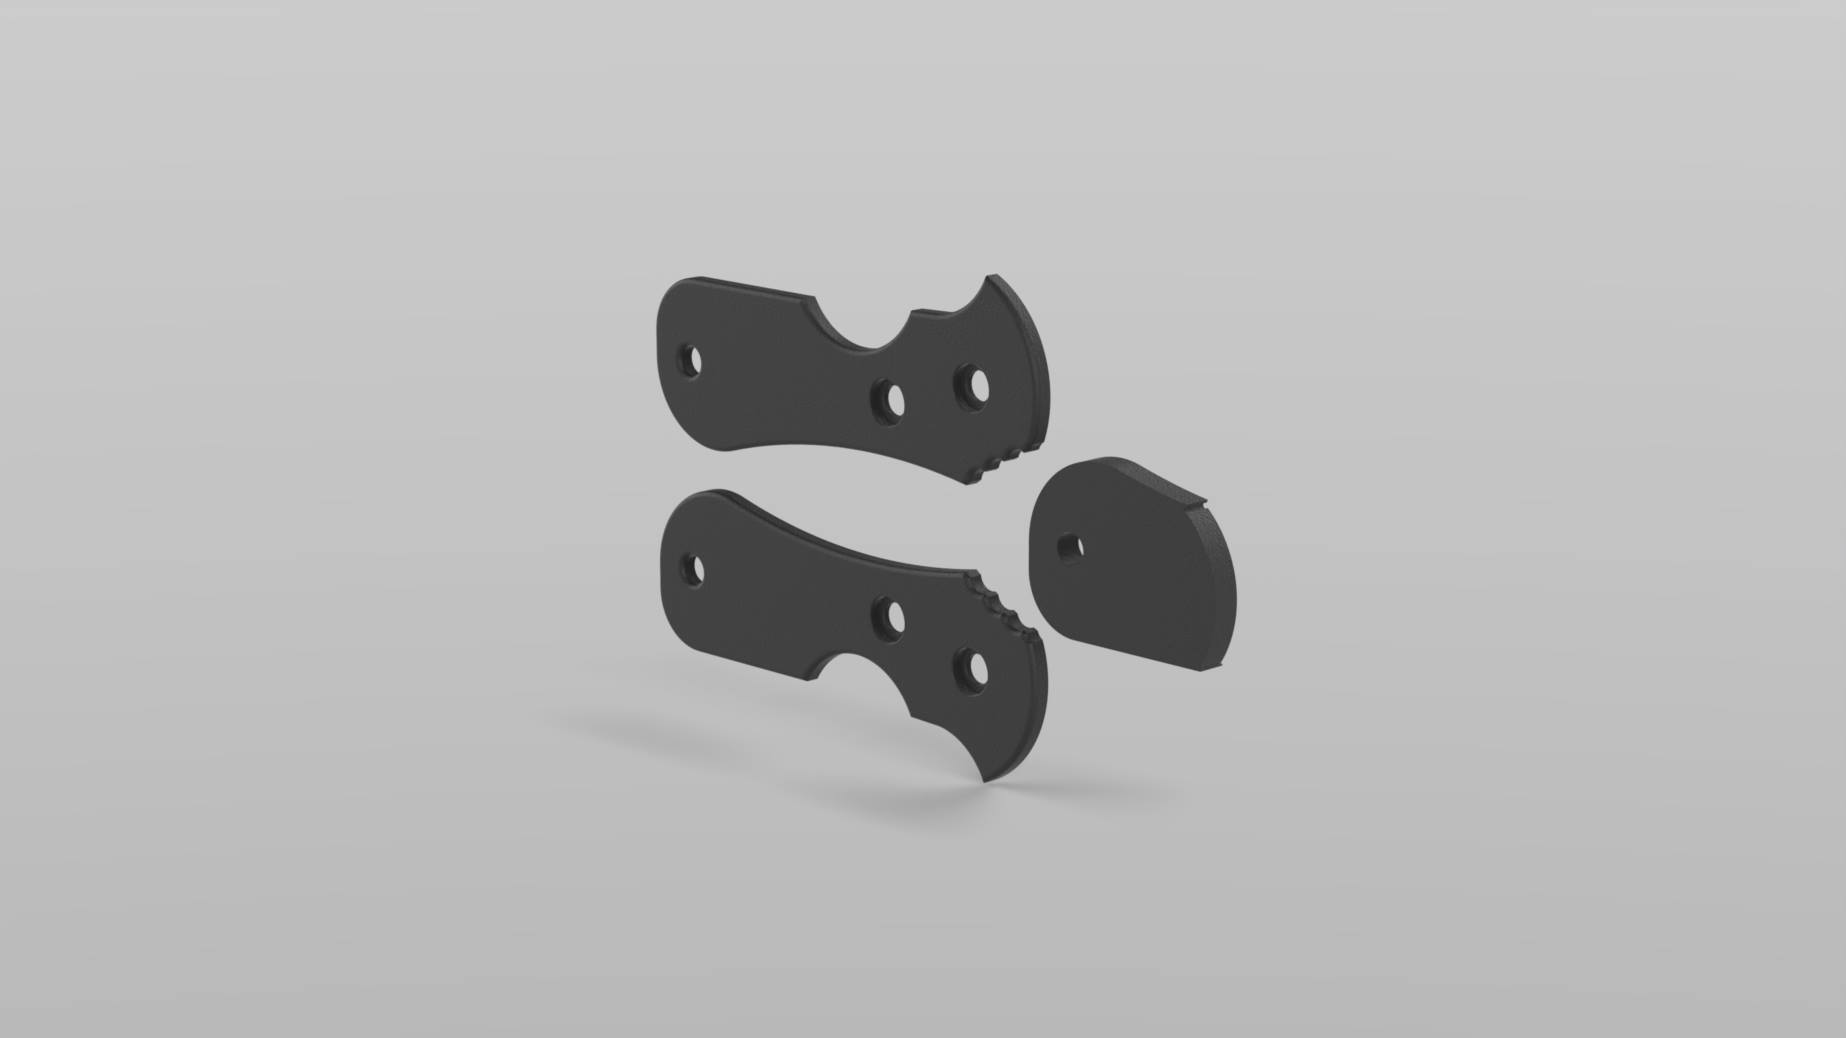 Böker Plus URD 2.0 Griff 4 Finger alle Muster Download zum selber Drucken